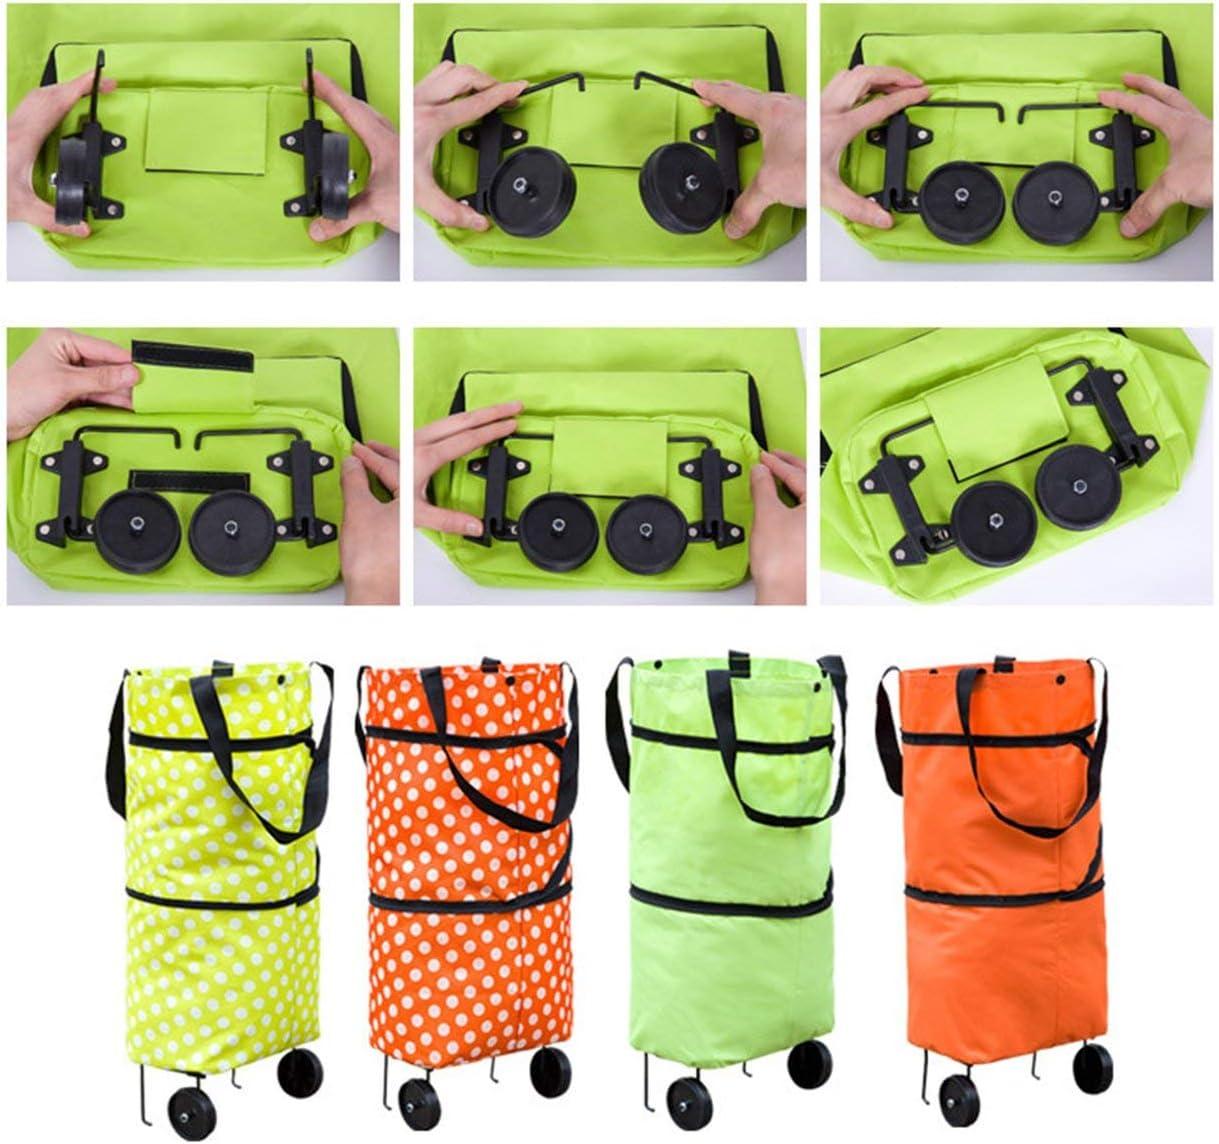 Lodenlli Fashionable Design Large Capacity Waterproof Oxford Cloth Foldable Shopping Trolley Wheel Bag Traval Cart Luggage Bag